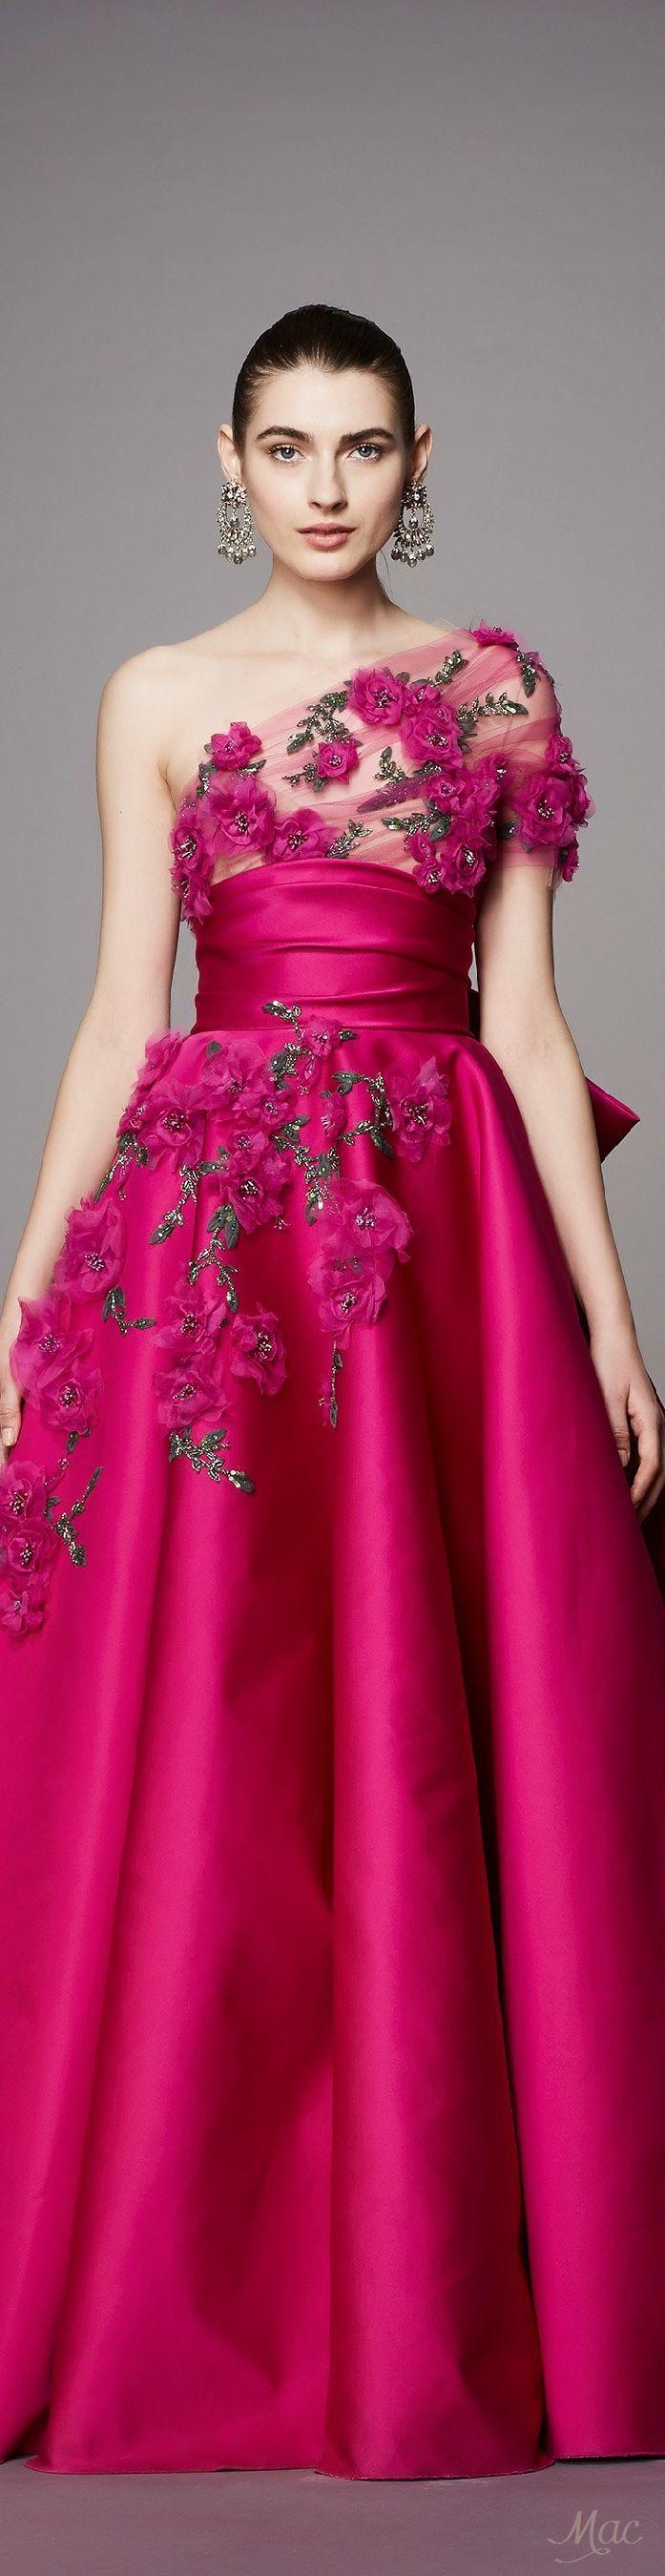 Mejores 1167 imágenes de Evening Dresses 2017 en Pinterest ...